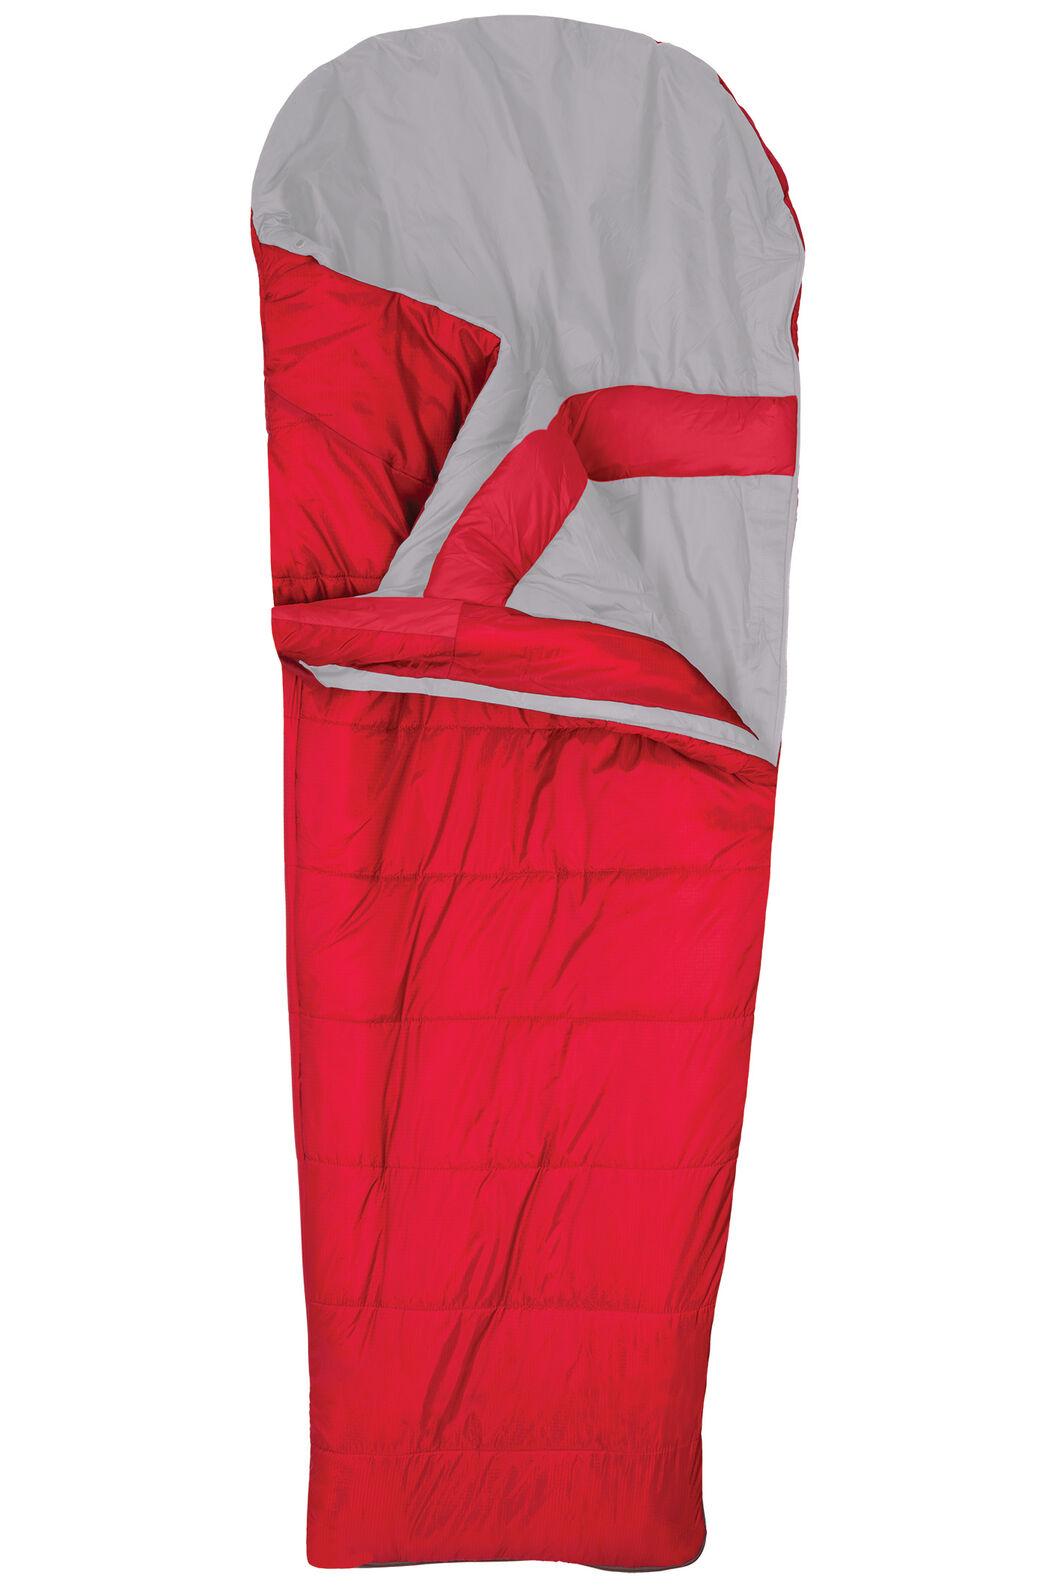 Macpac Roam 150 VapourLite™ Kids' Synthetic Sleeping Bag, Crimson, hi-res